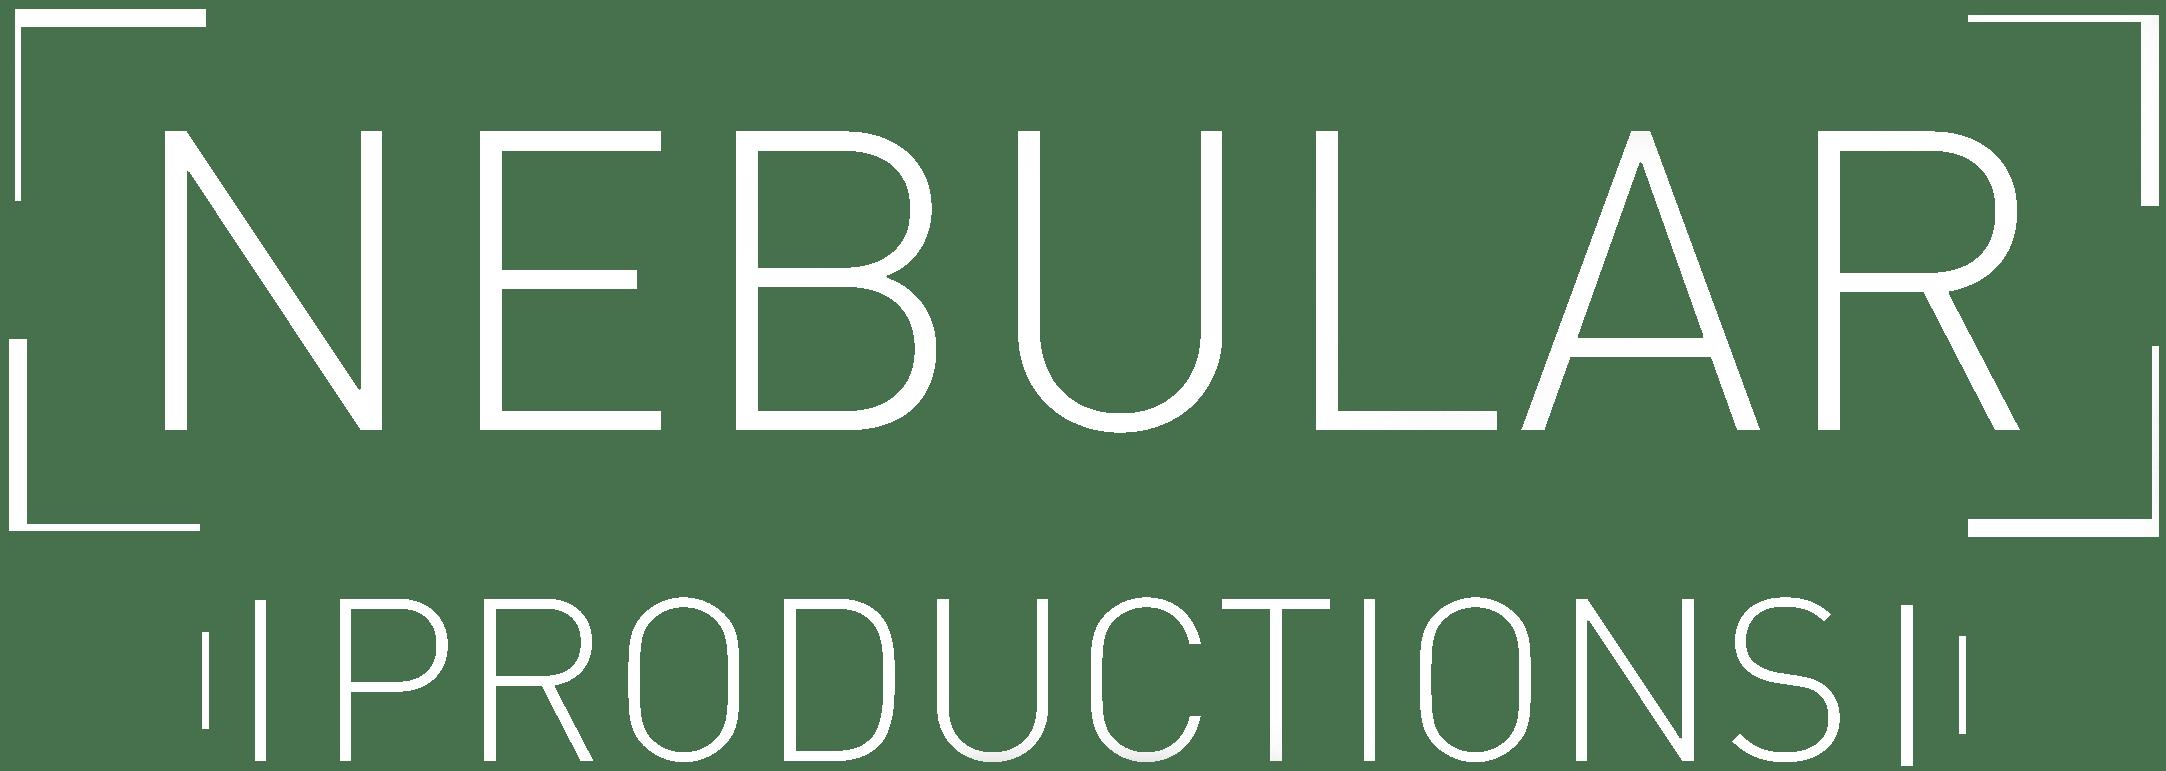 NEBULAR PRODUCTIONS